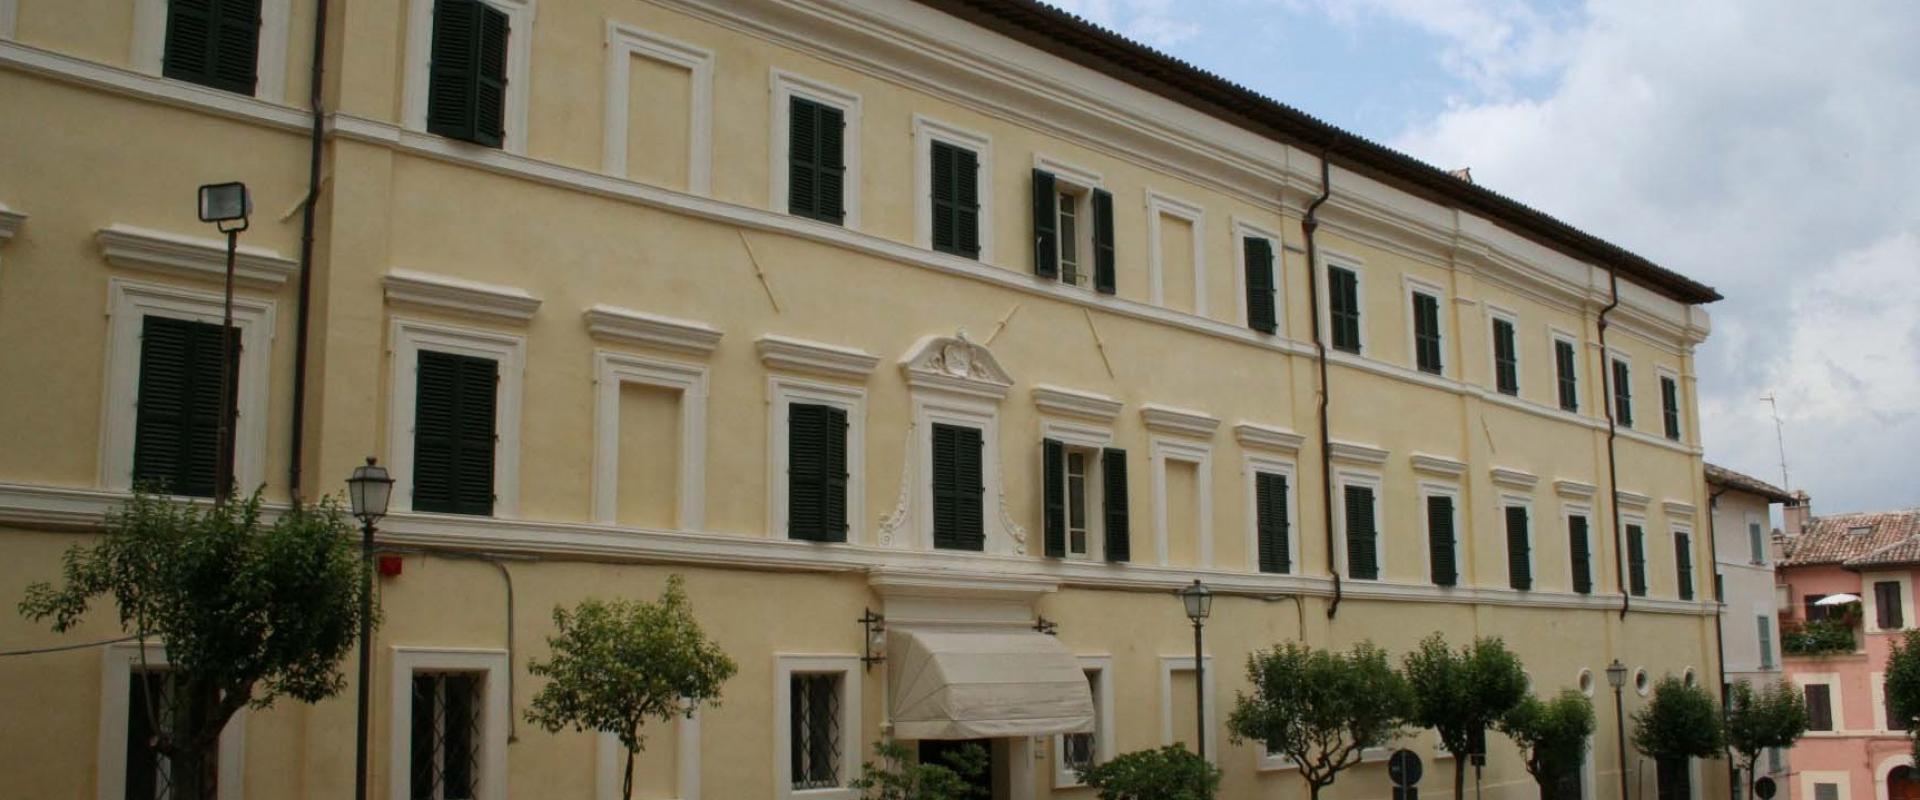 hotel in San Gemini